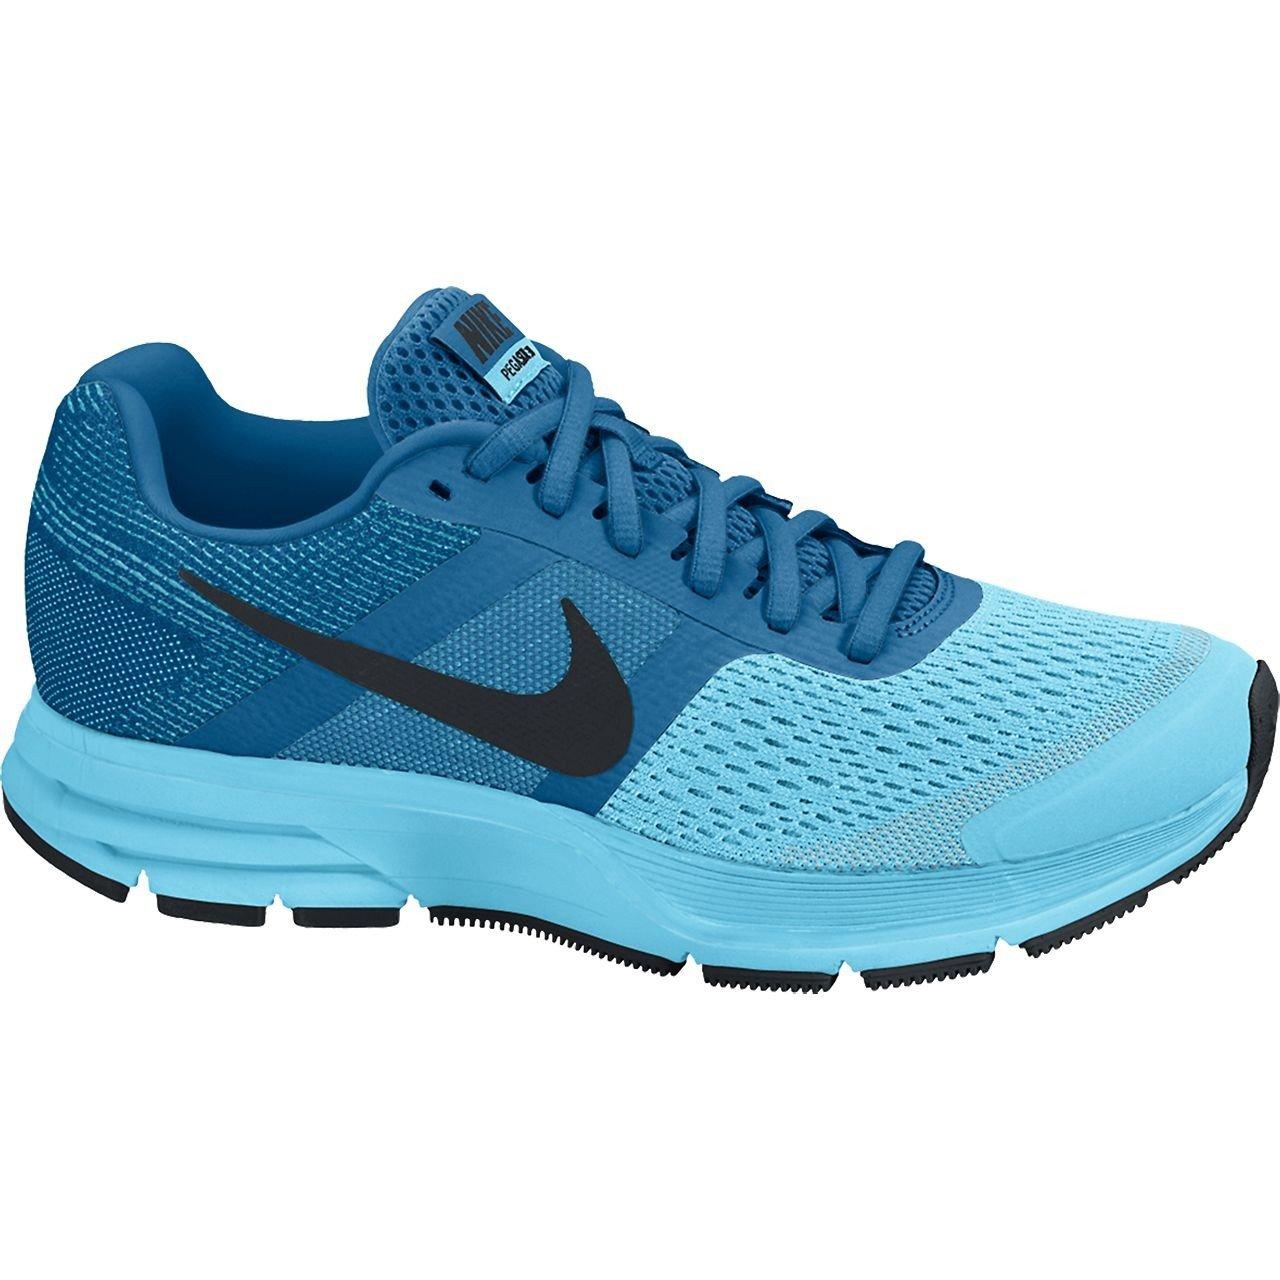 the latest 85a95 76442 Amazon.com | Nike Air Pegasus 30 Men's Running Shoes, Blue ...